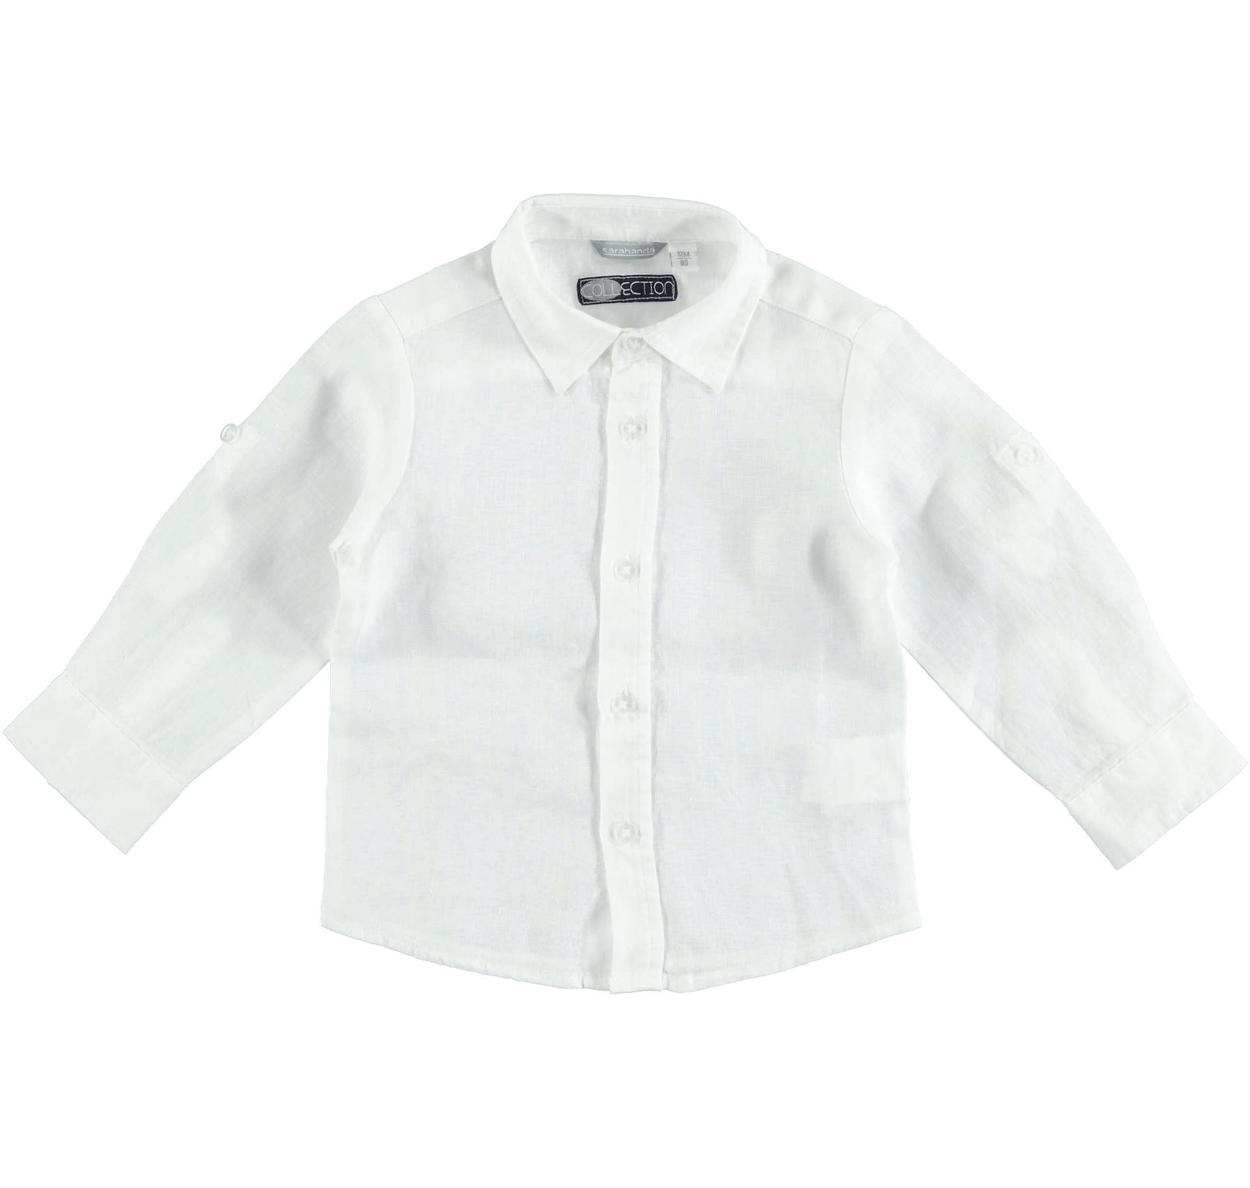 sale retailer a72e9 f740f Camicia in morbido e fresco lino 100% per bambino da 6 mesi a 7 anni  Sarabanda